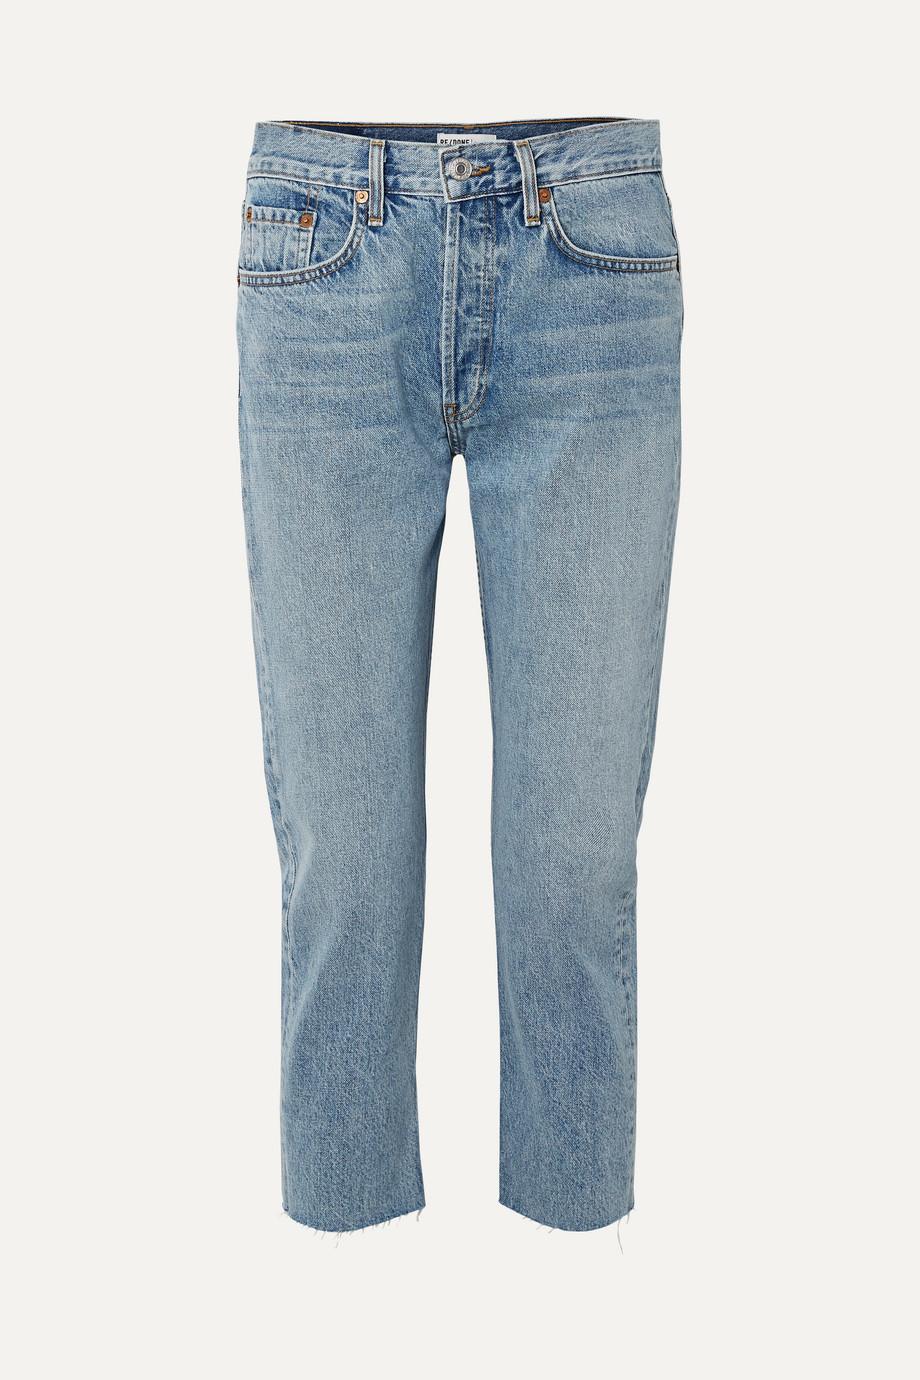 RE/DONE Cropped mid-rise slim boyfriend jeans